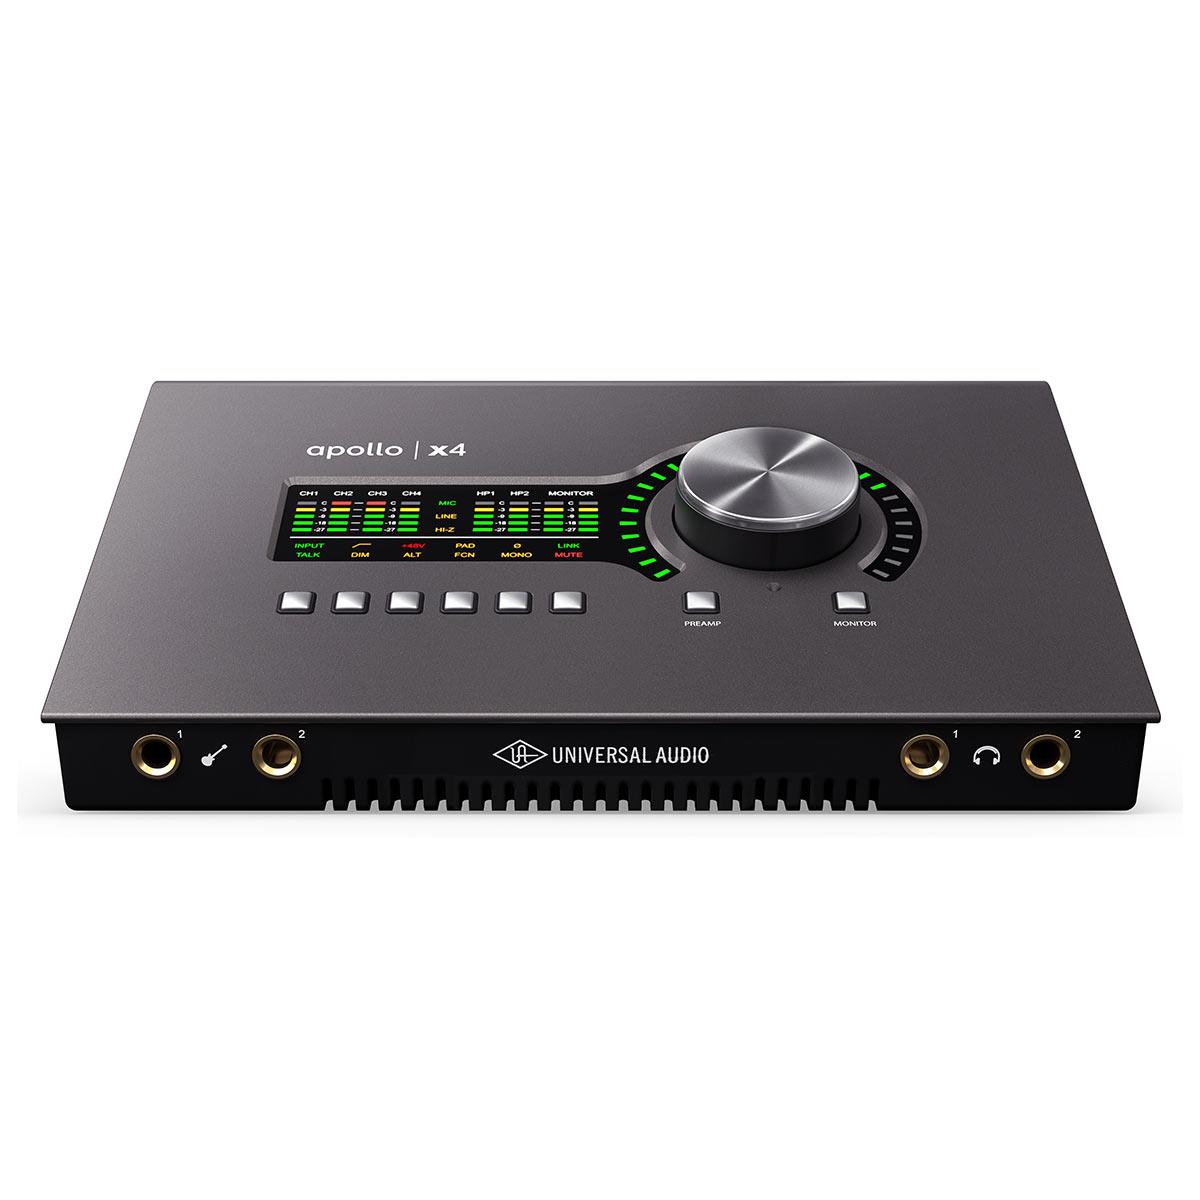 Introducing the Universal Audio Apollo X4